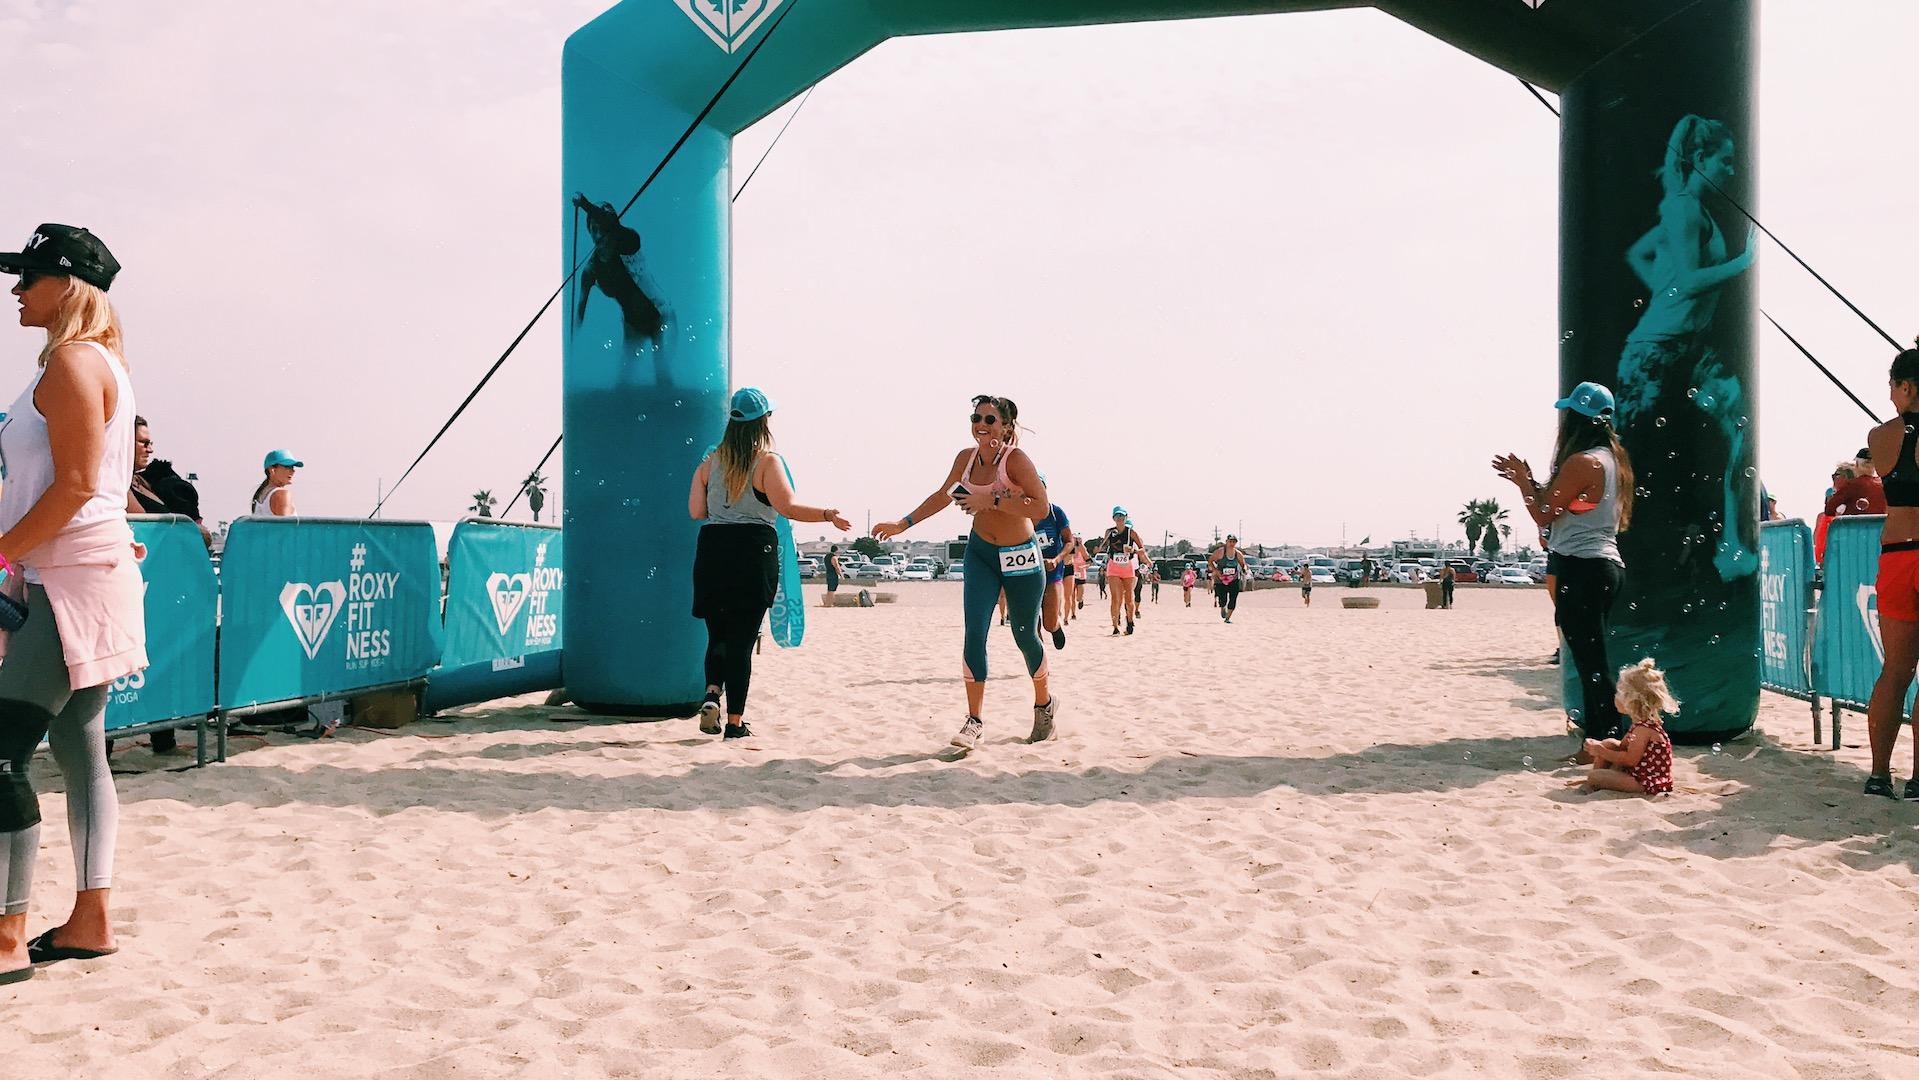 roxy-fitness-huntington beach-california.JPG